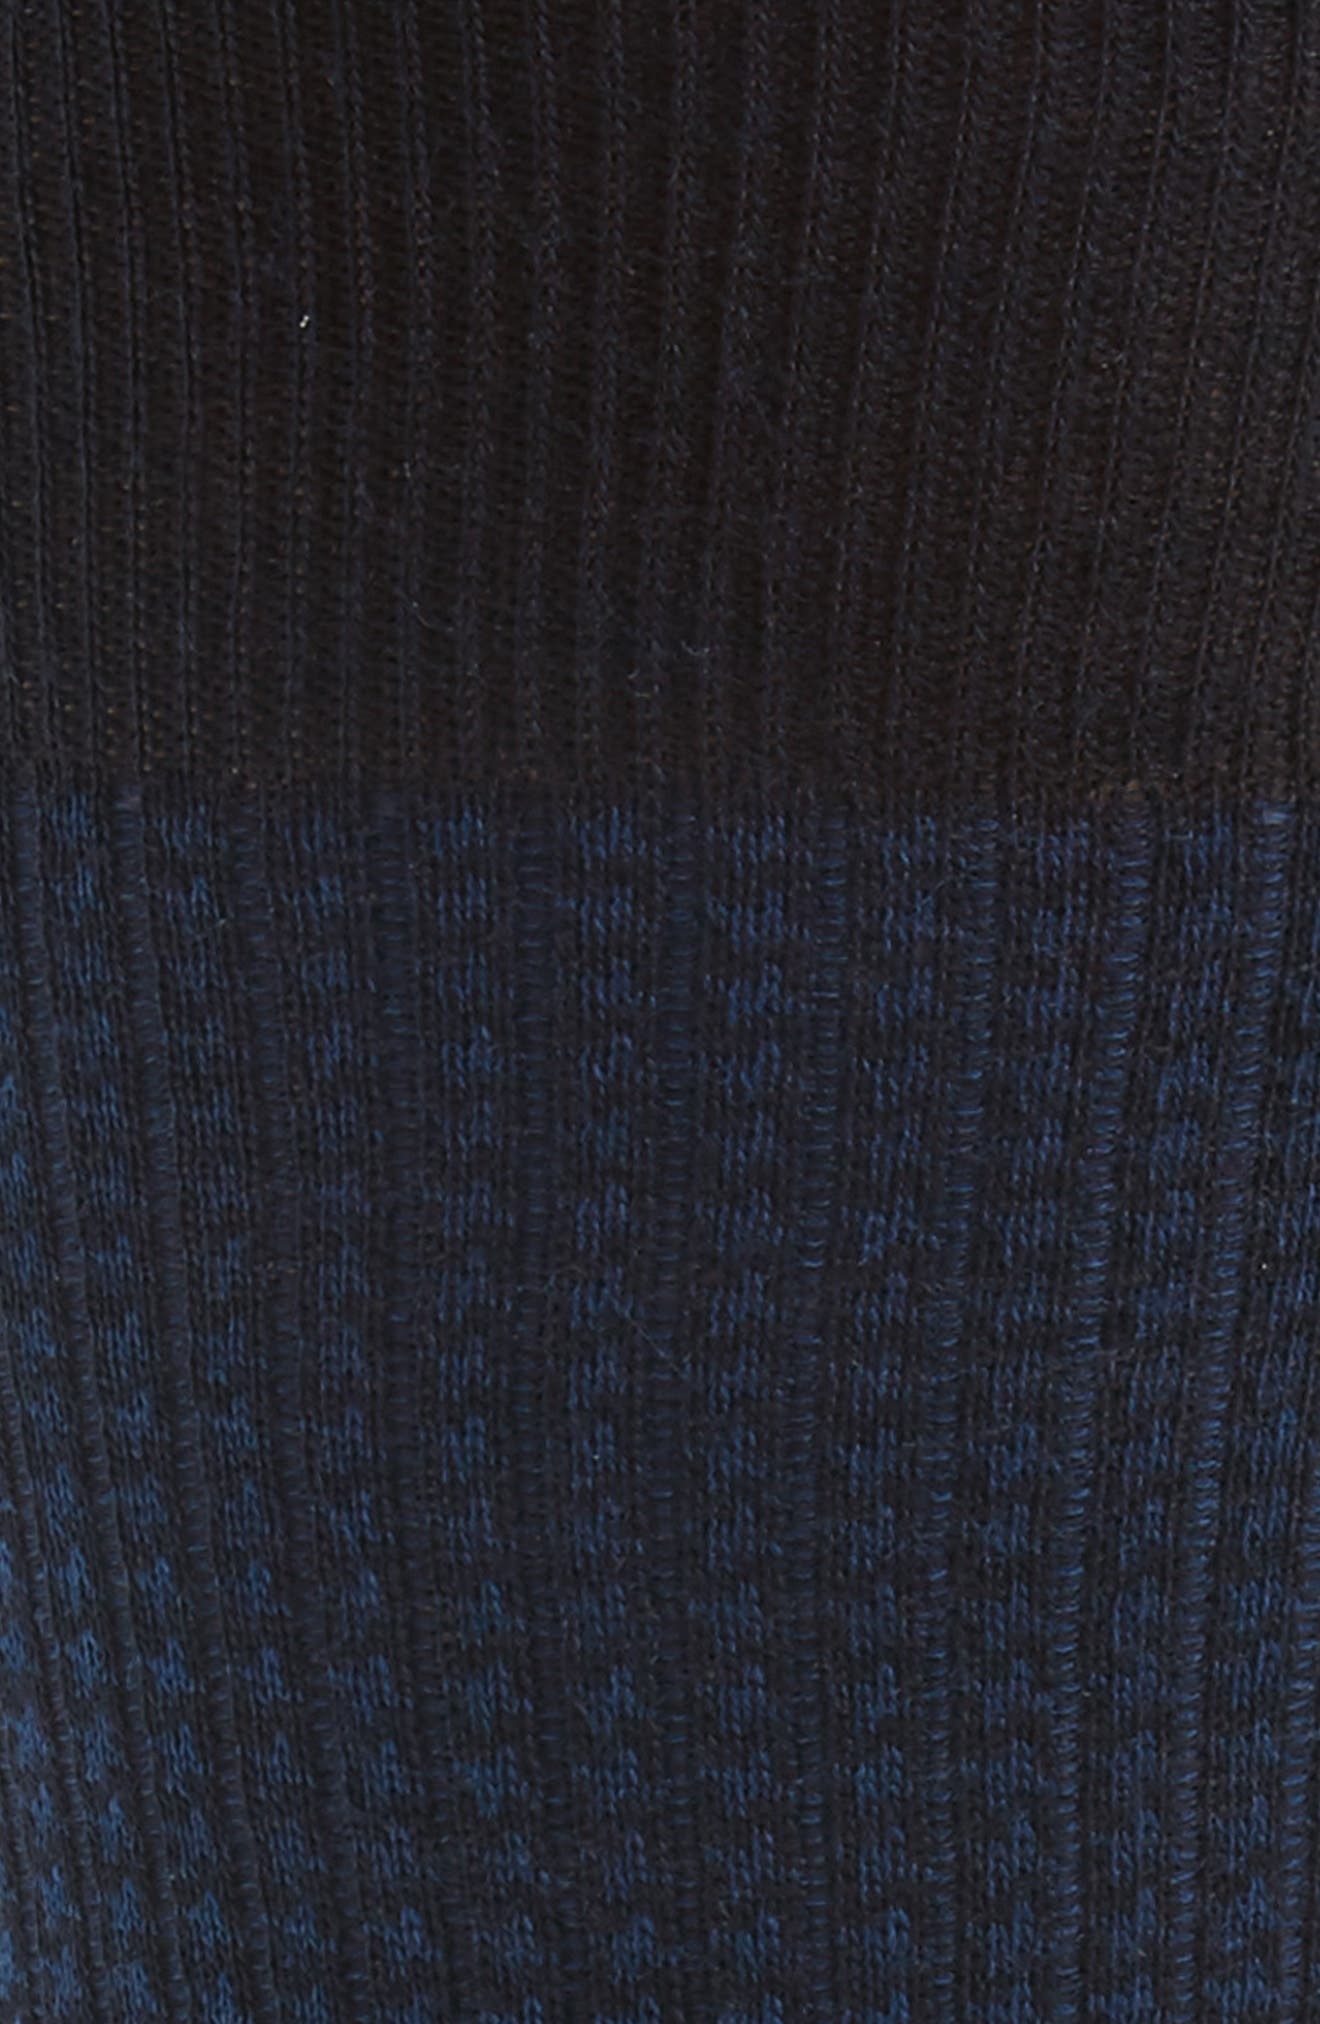 Houndstooth Wool Blend Socks,                             Alternate thumbnail 2, color,                             Navy